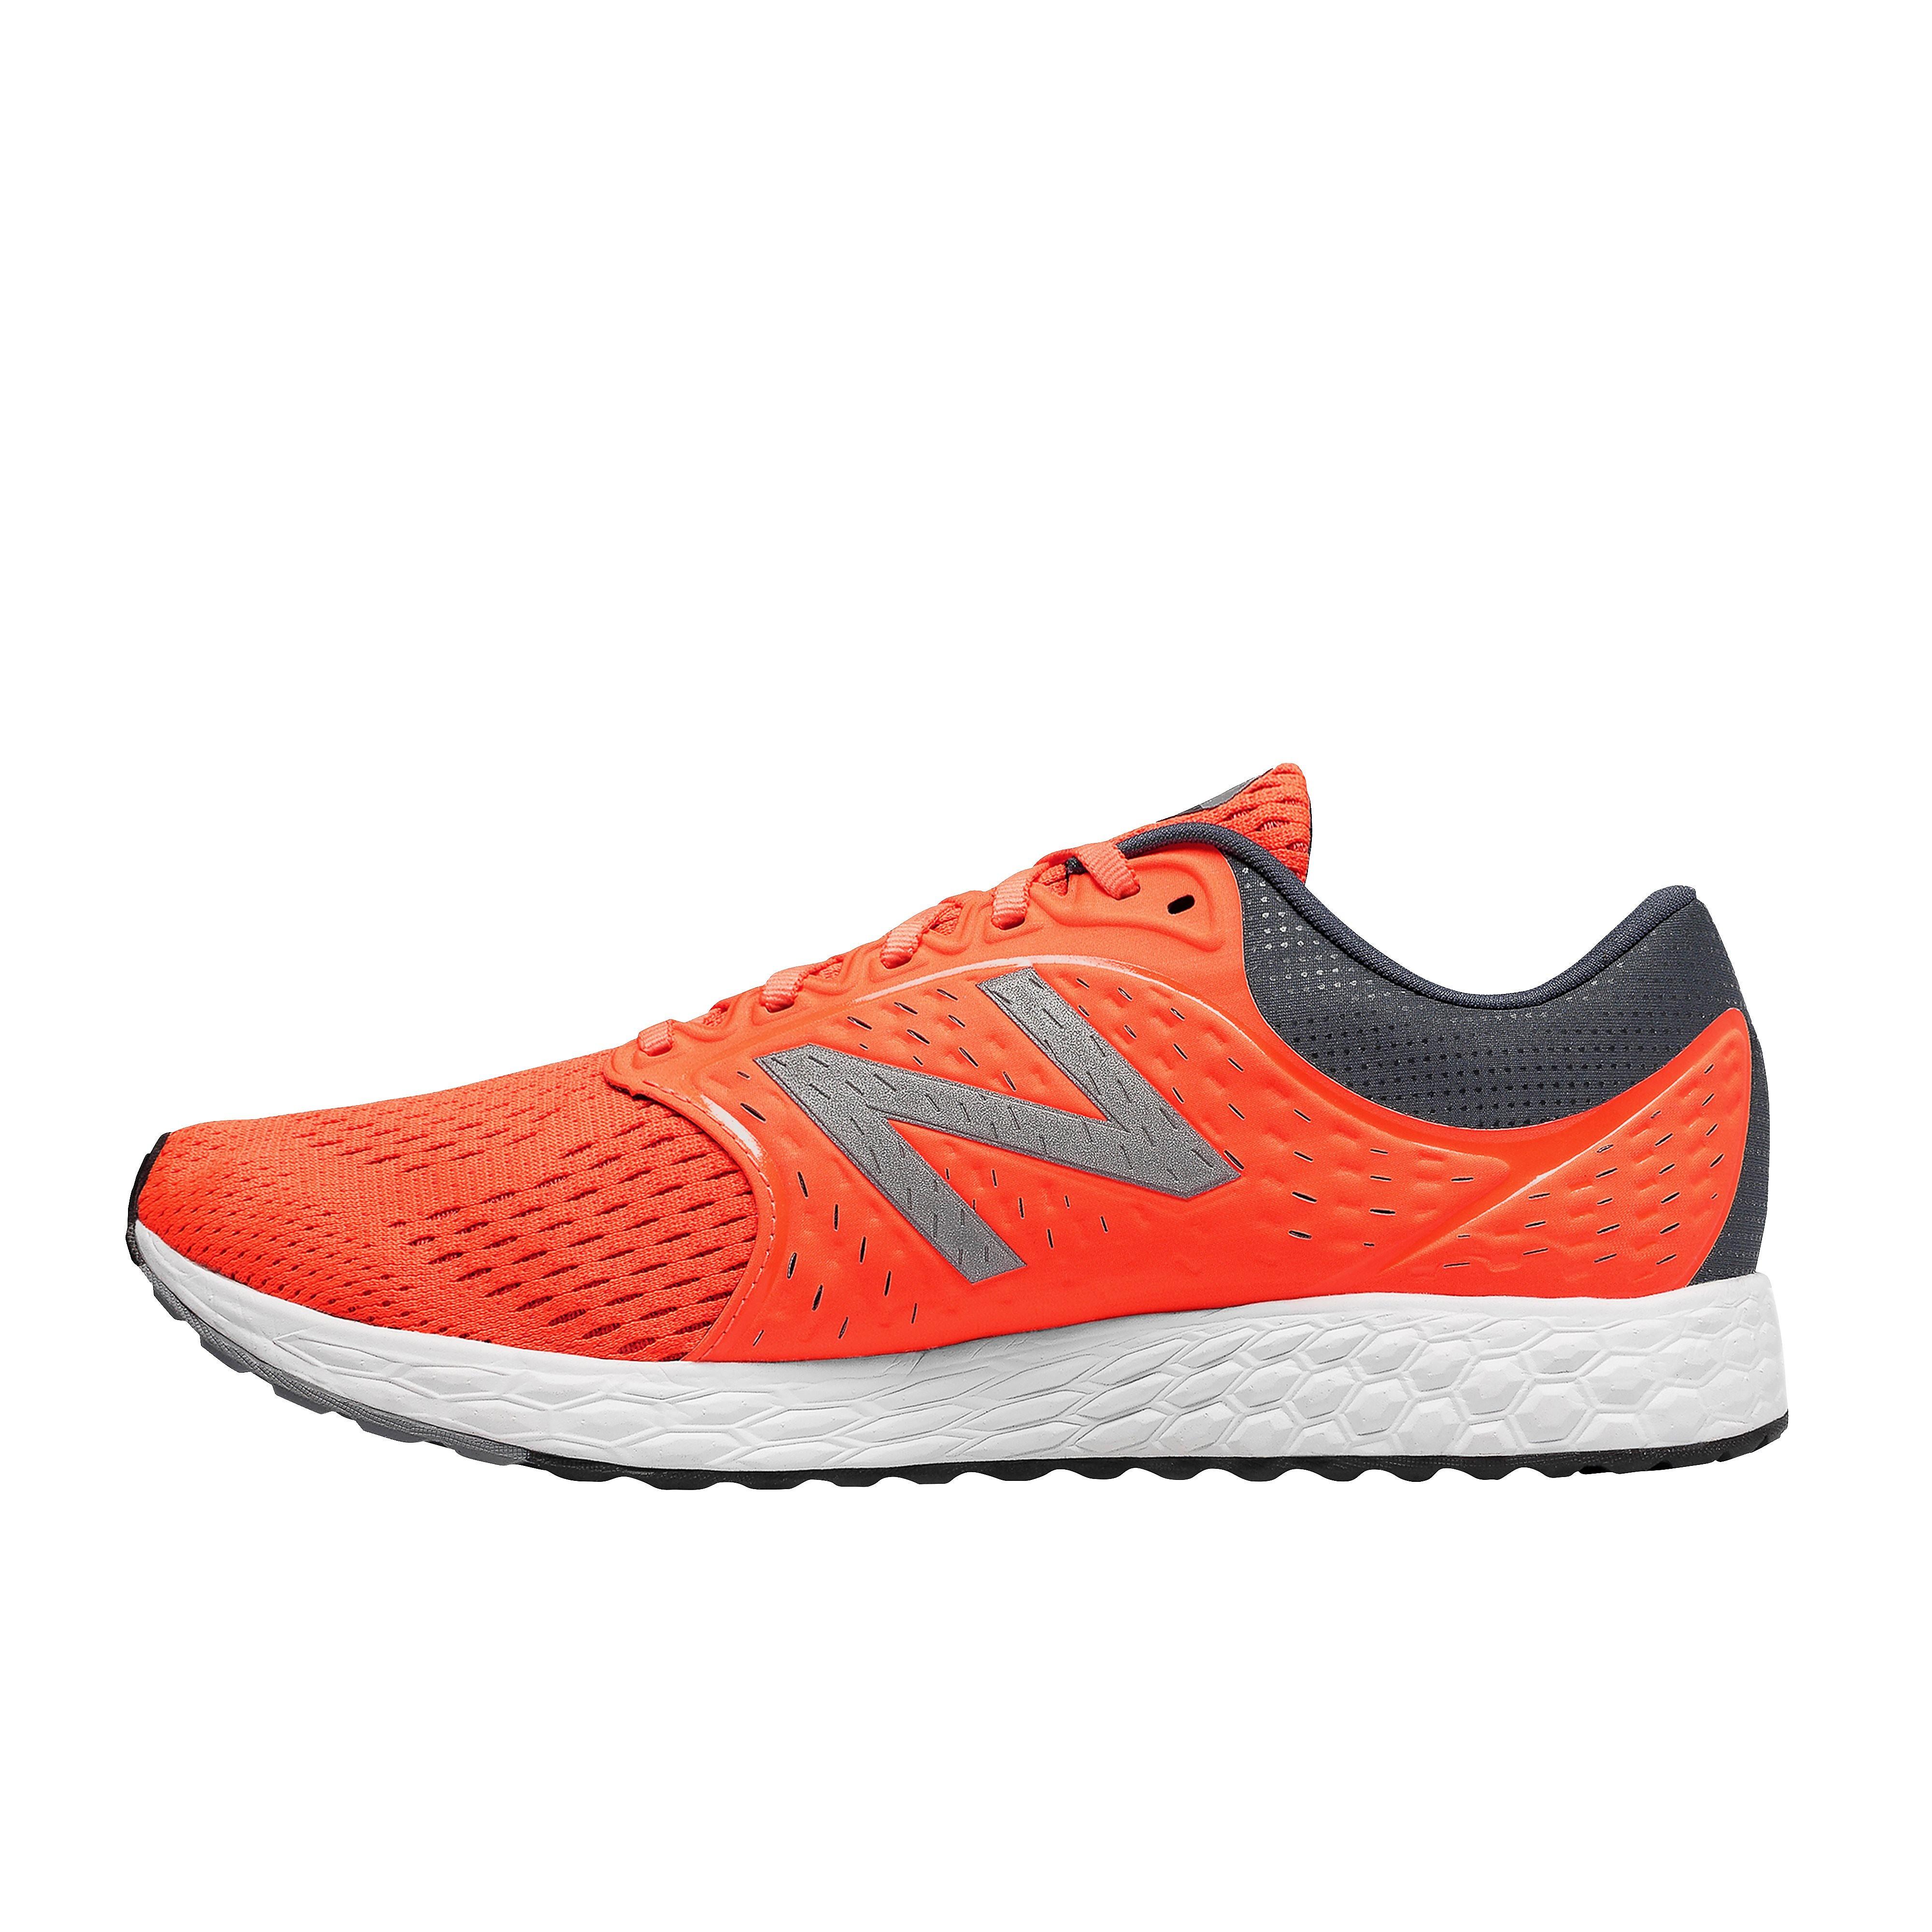 Men's New Balance Fresh Foam Zante V4 Running Shoes - Orange, Orange